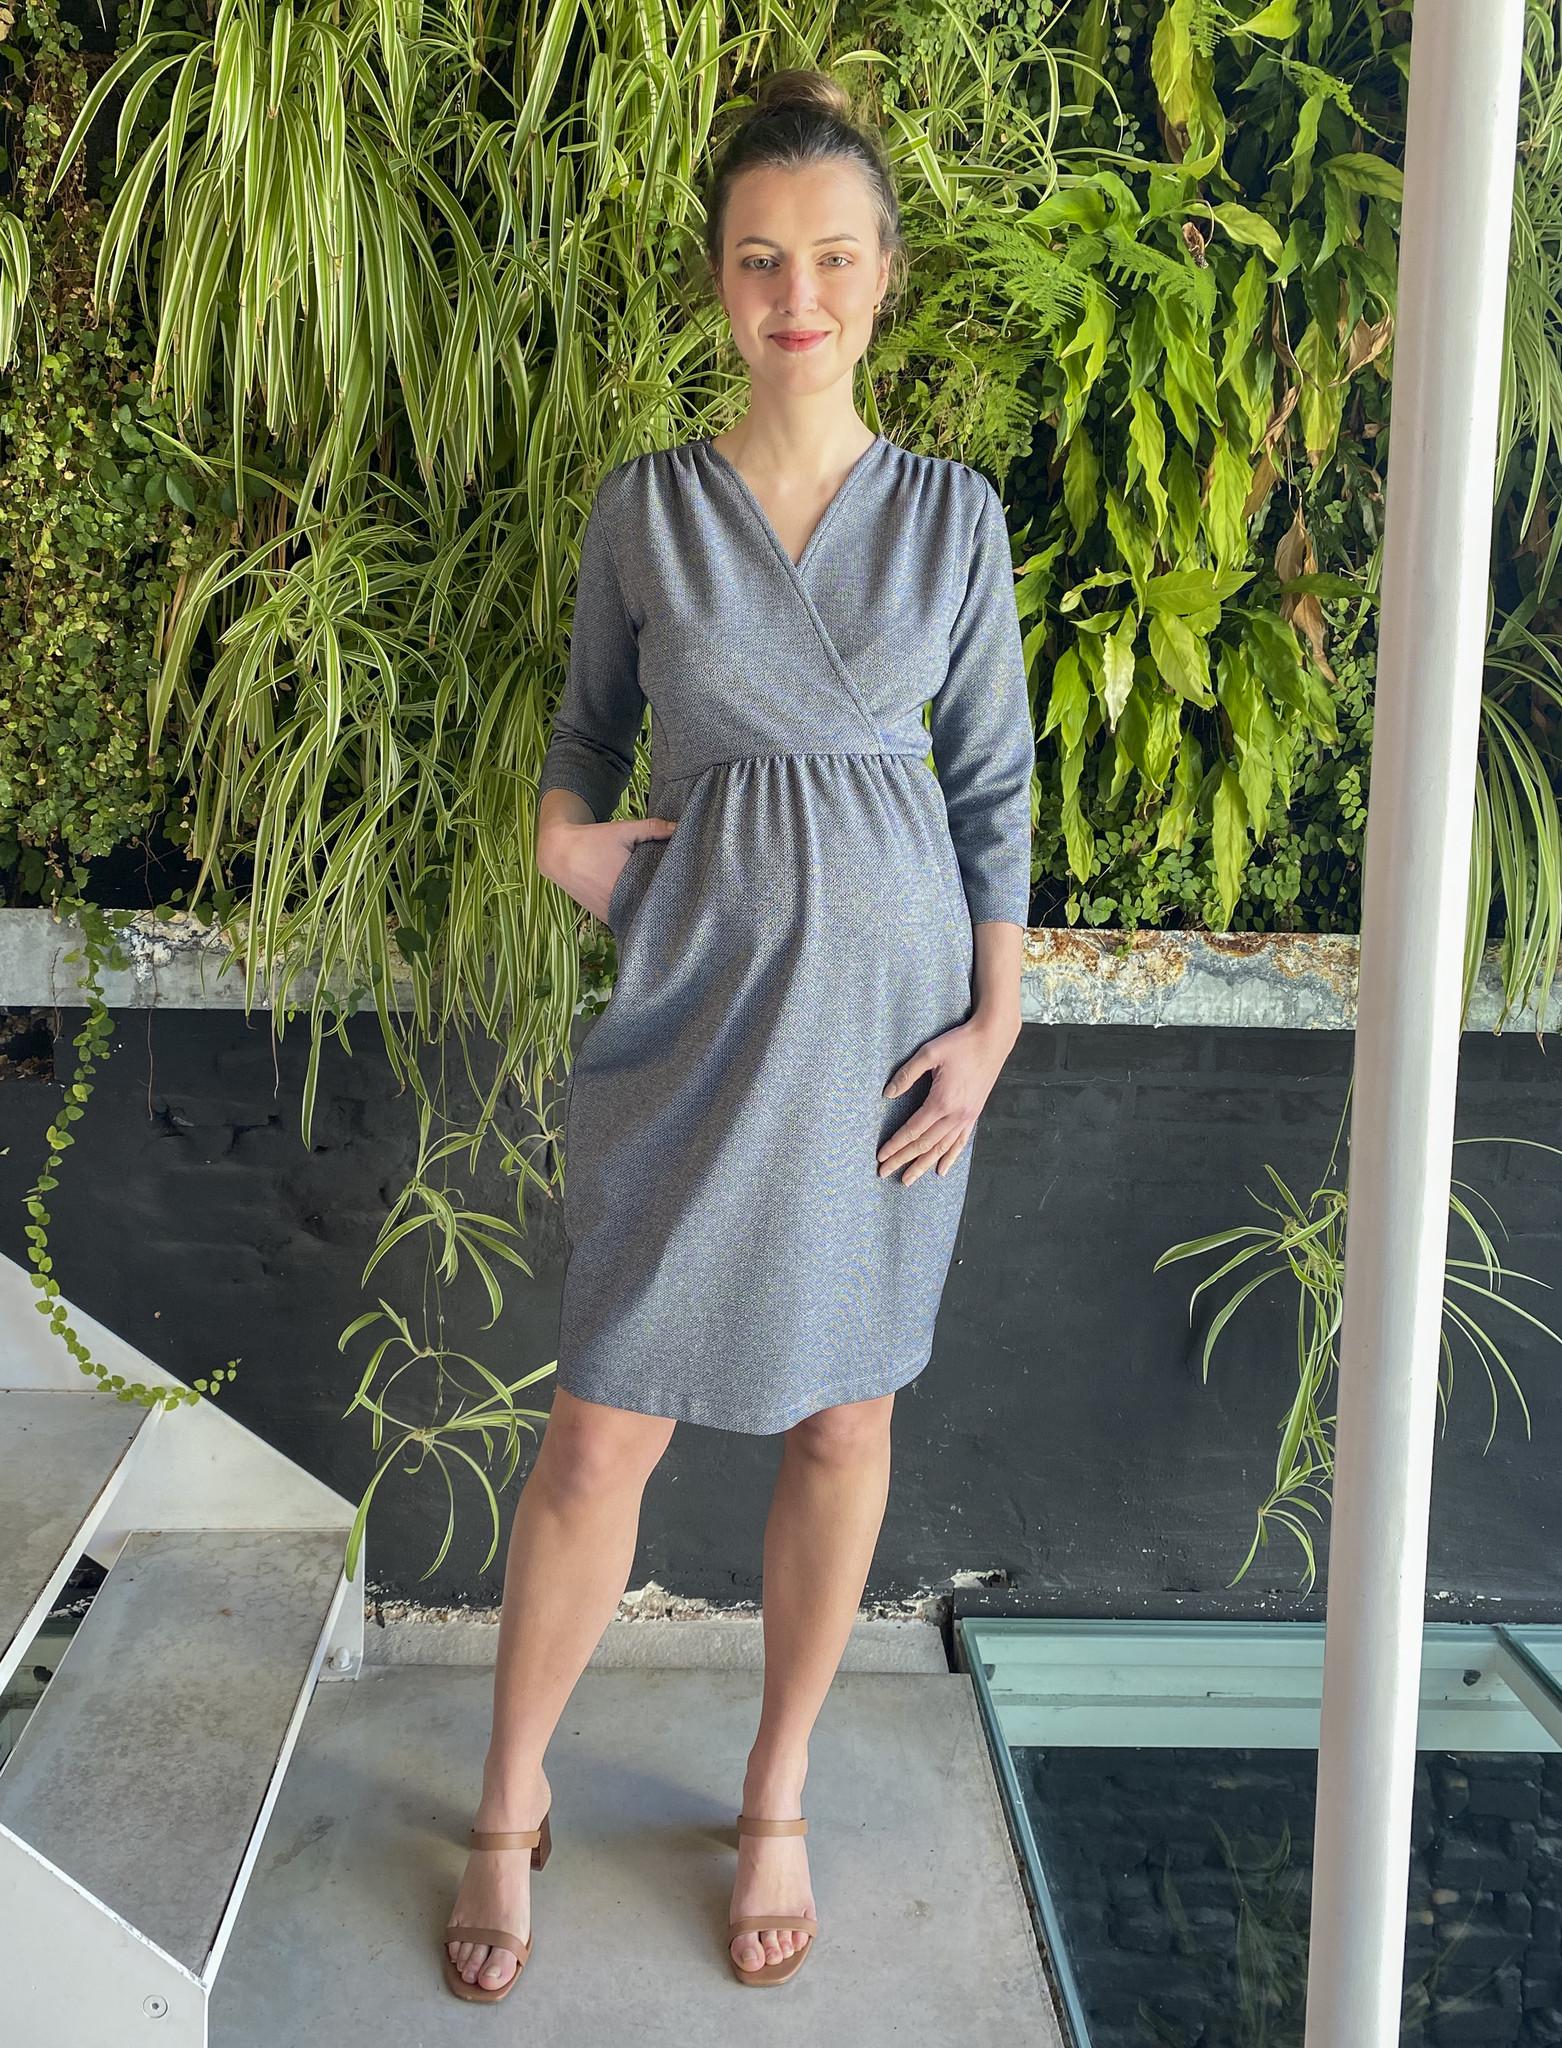 Comfy Dress 7/8 Sleeves Jeans Sparkle-1